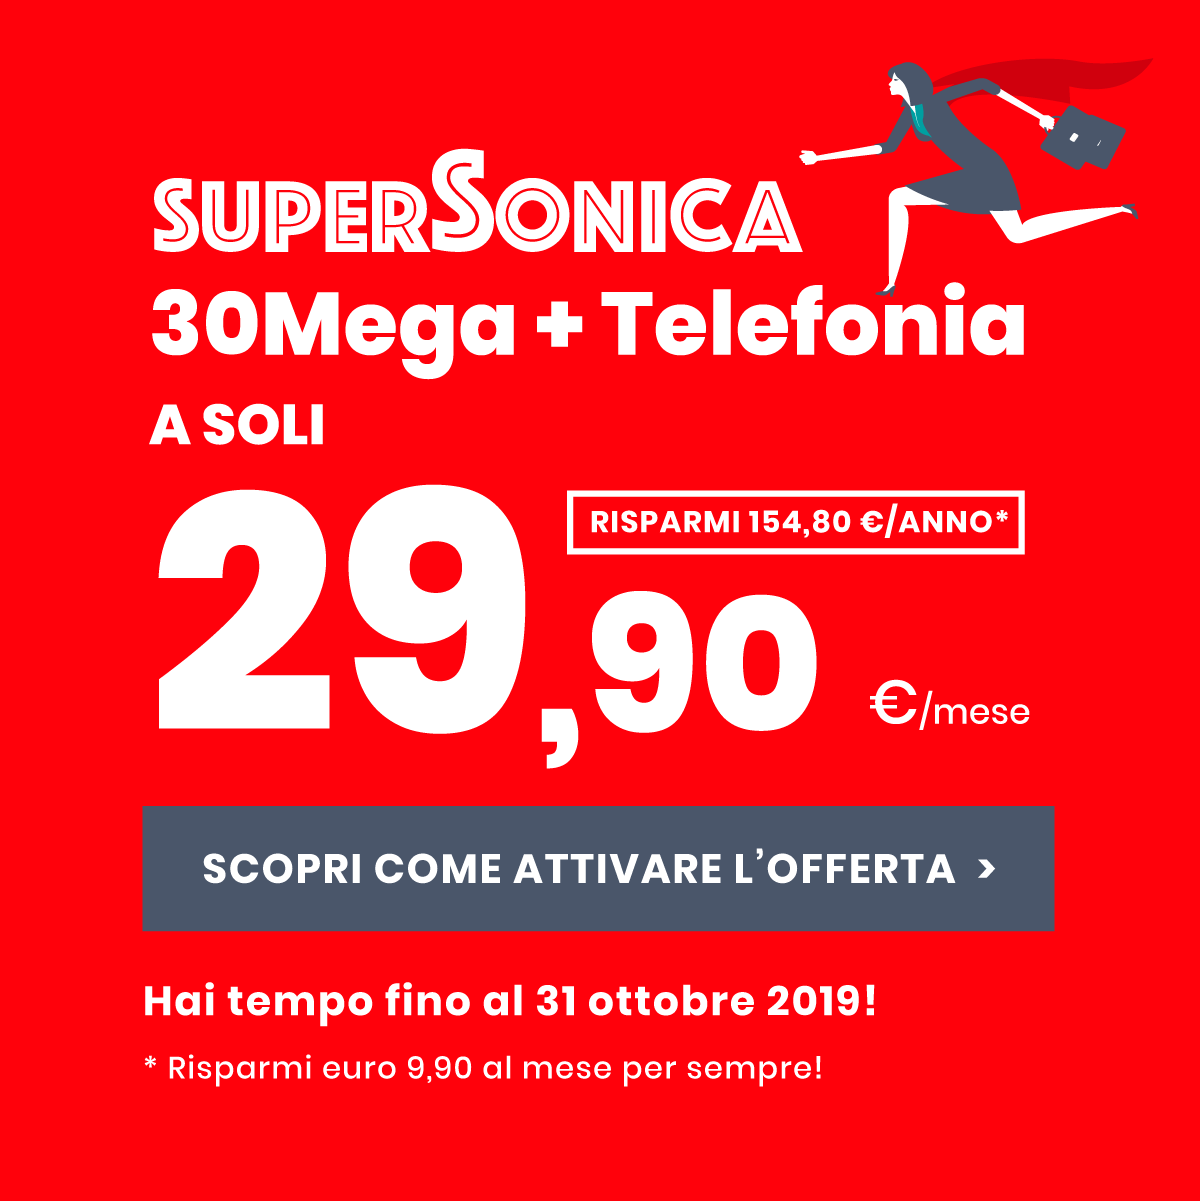 supersonica sonicatel